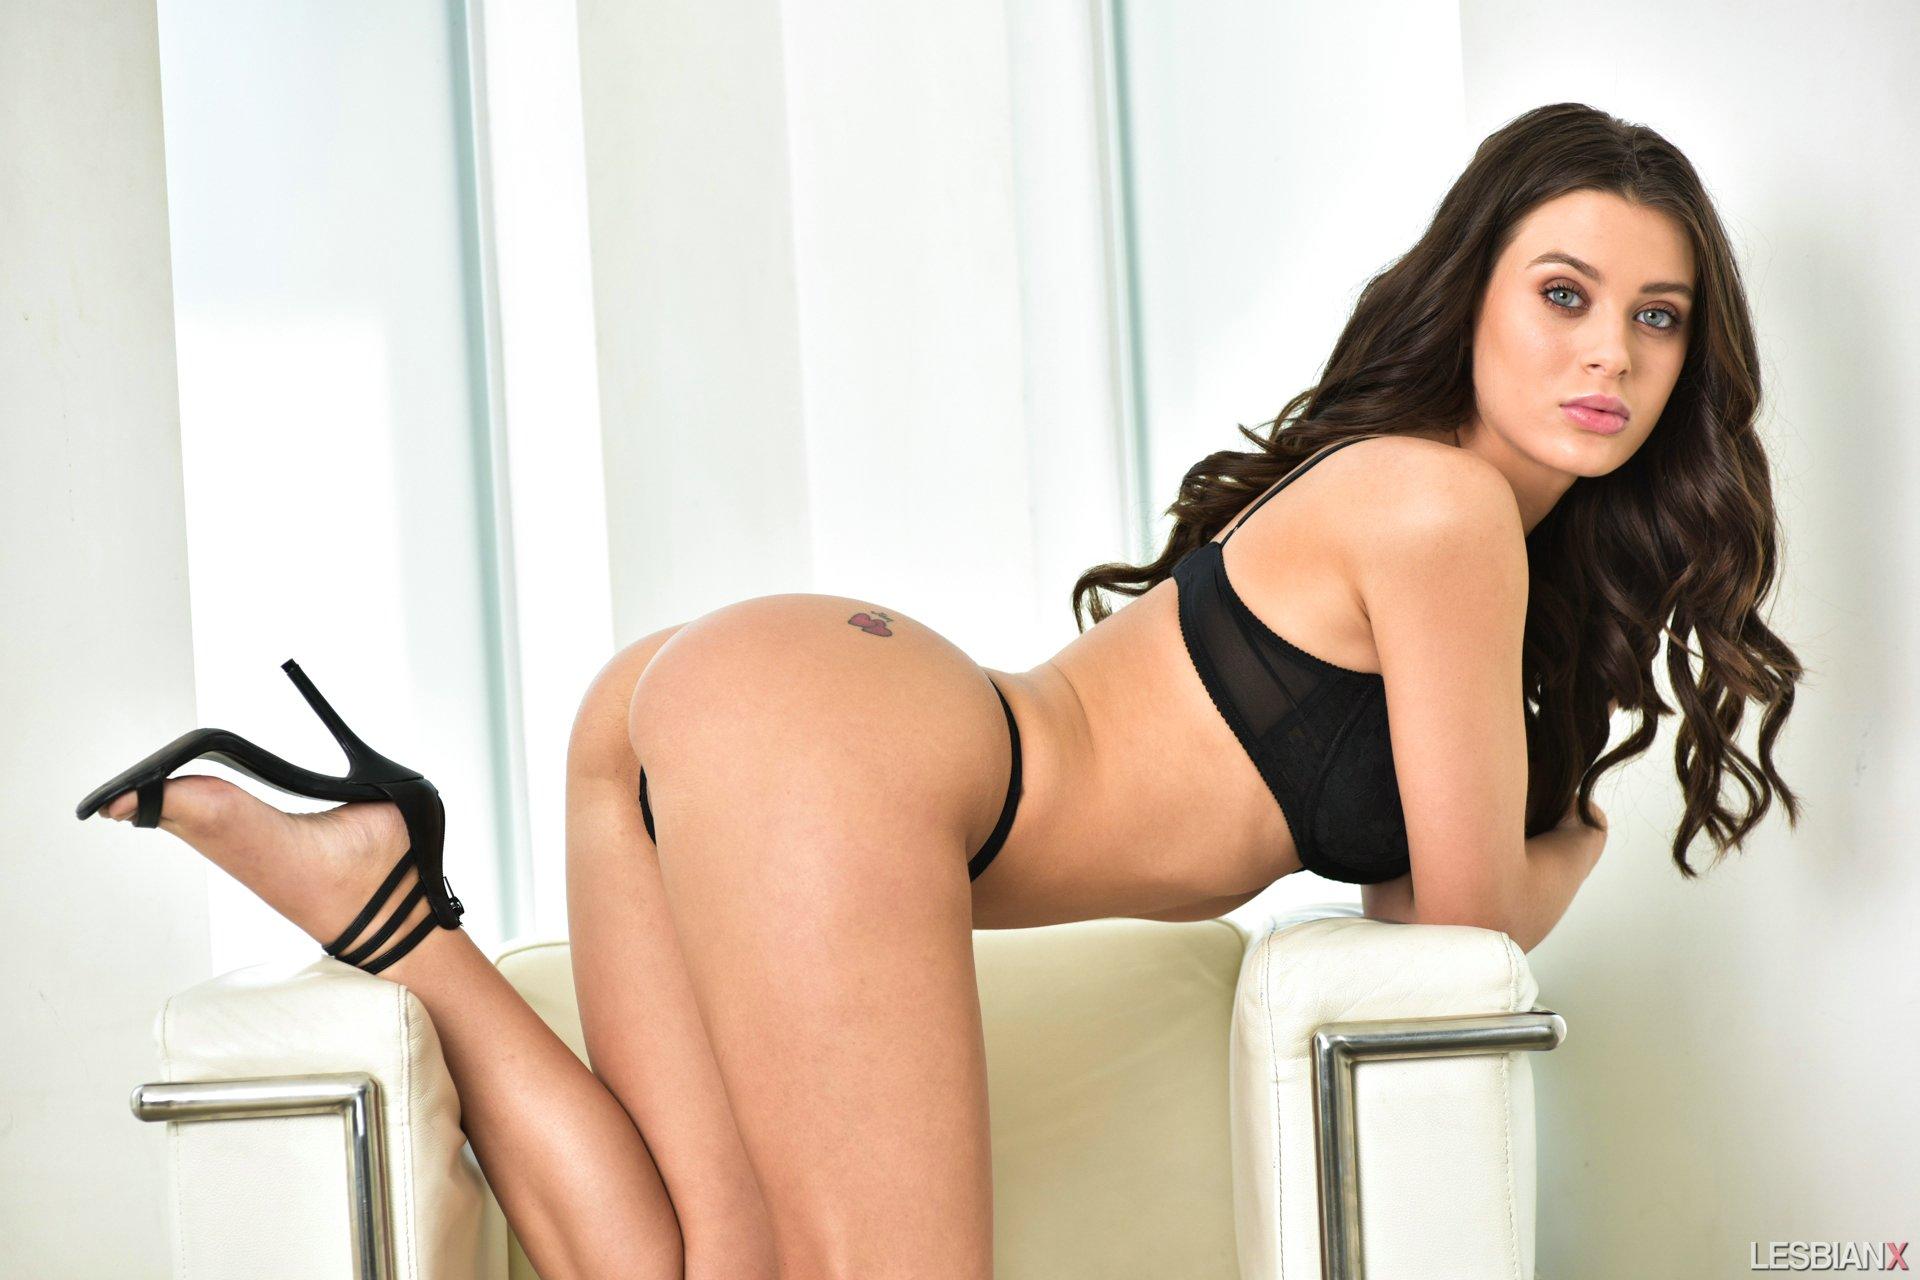 Lana rhoades stripping